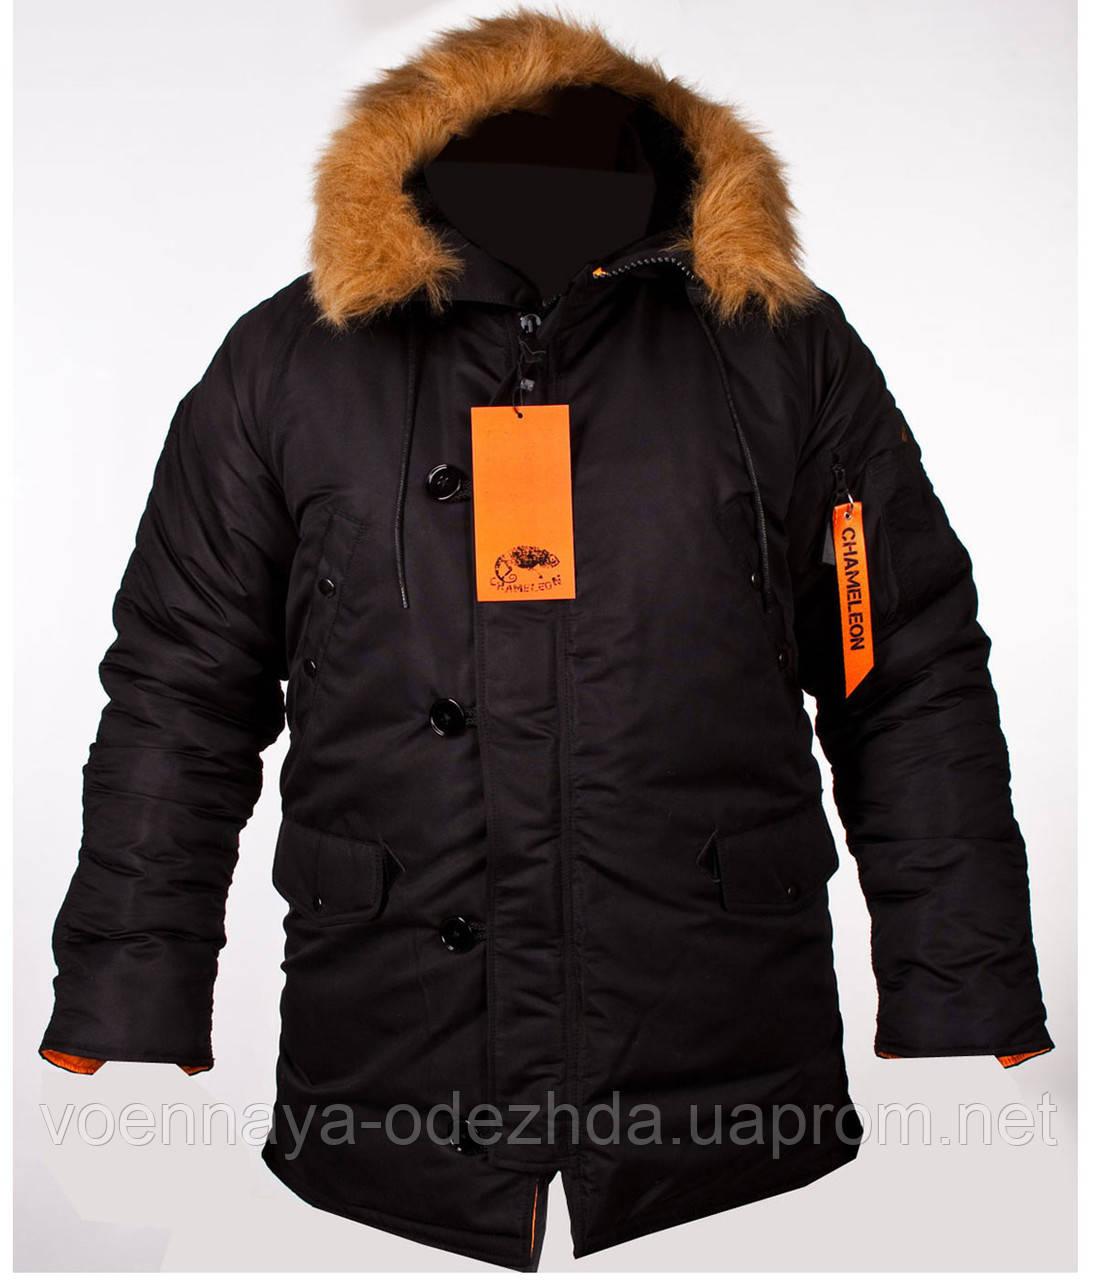 N 3b Chameleon Куртка з...